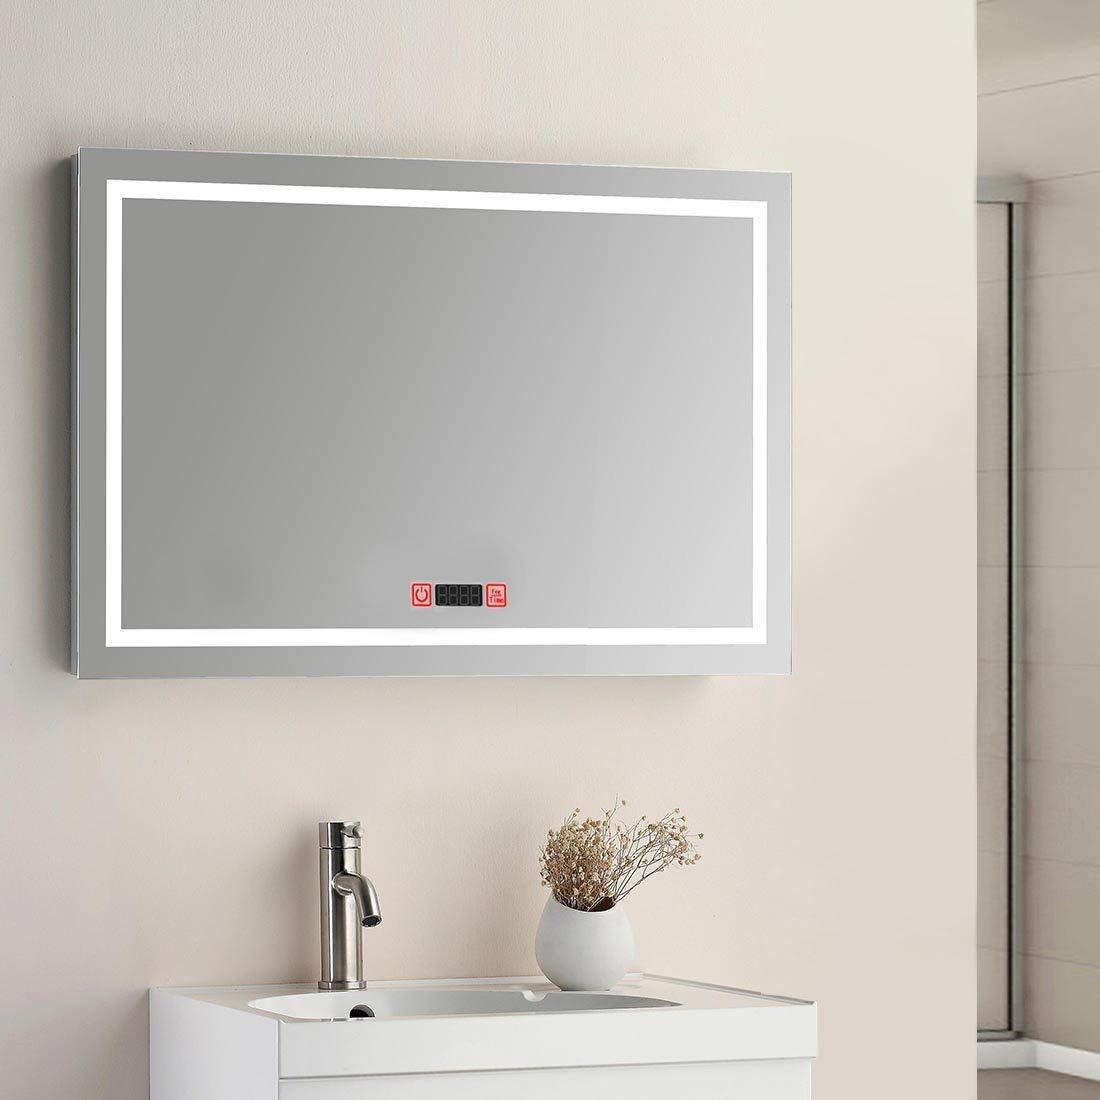 Cheap 24 X 48 Mirror Find 24 X 48 Mirror Deals On Line At Alibaba Com